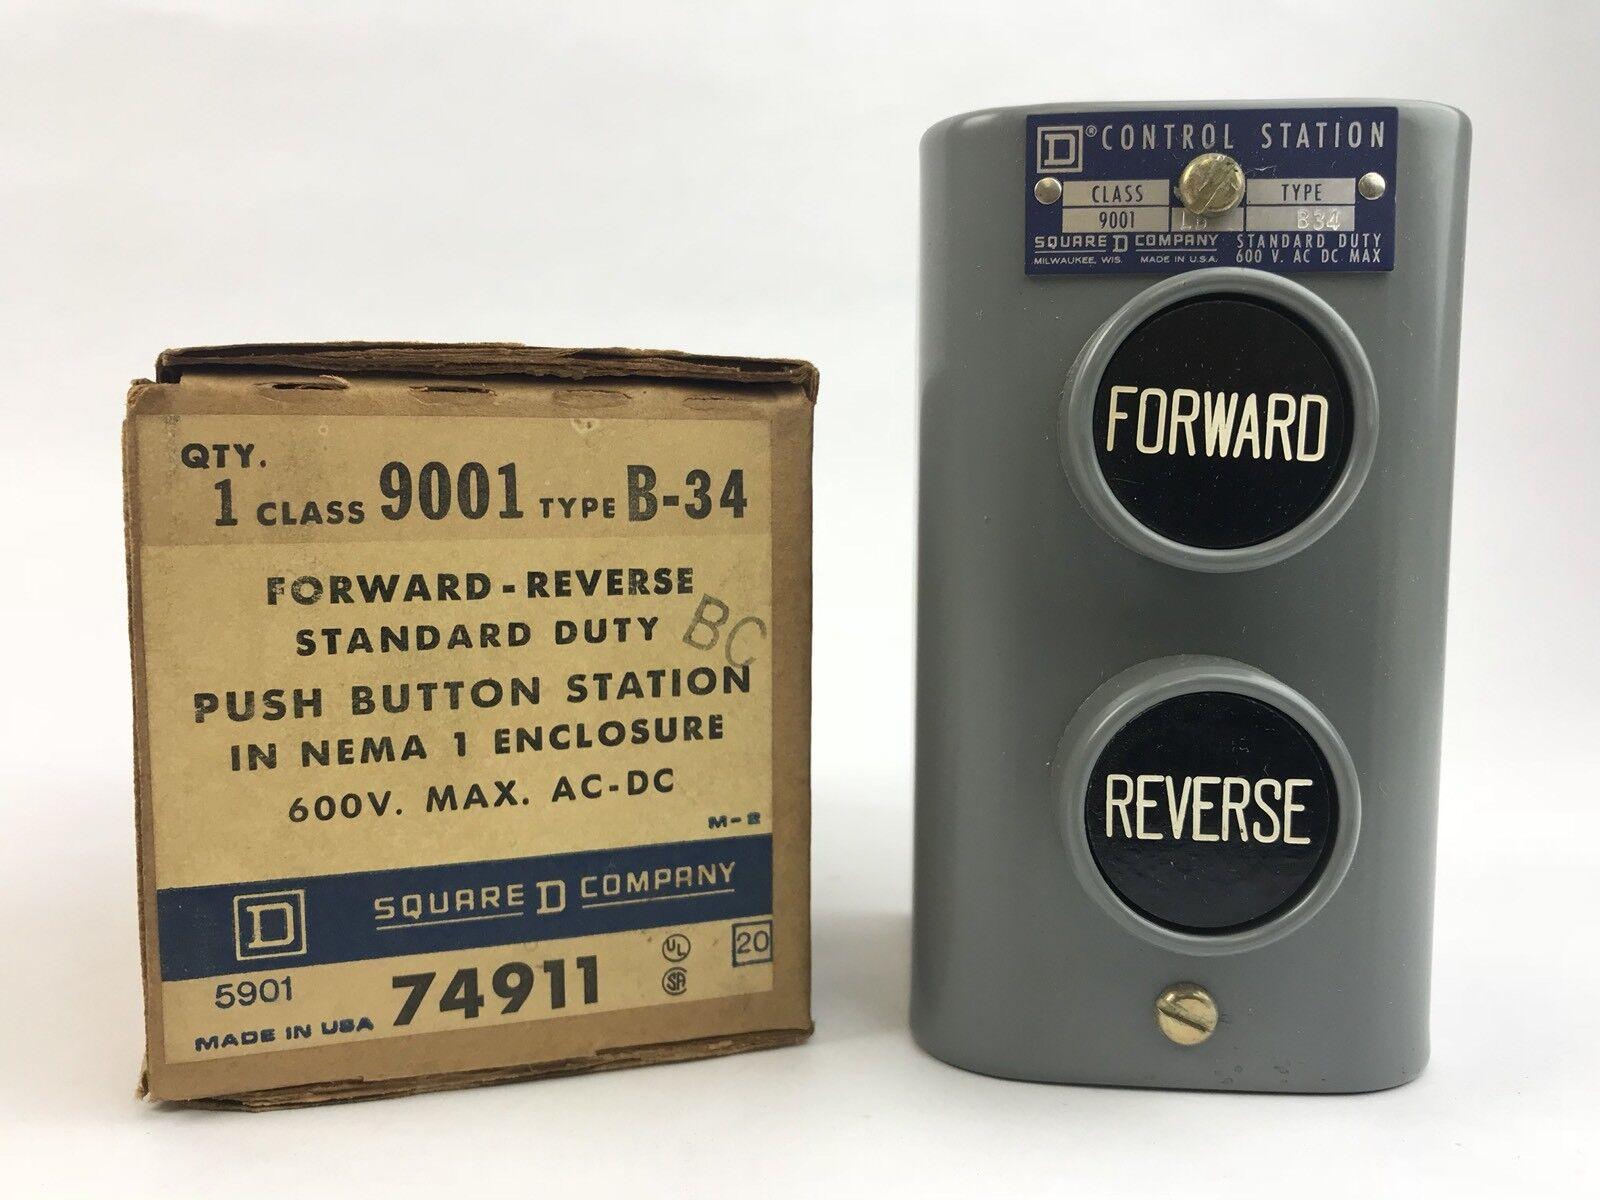 Square D 9001 B-34 Forward-Reverse Push Button Station 600 V Max AC DC